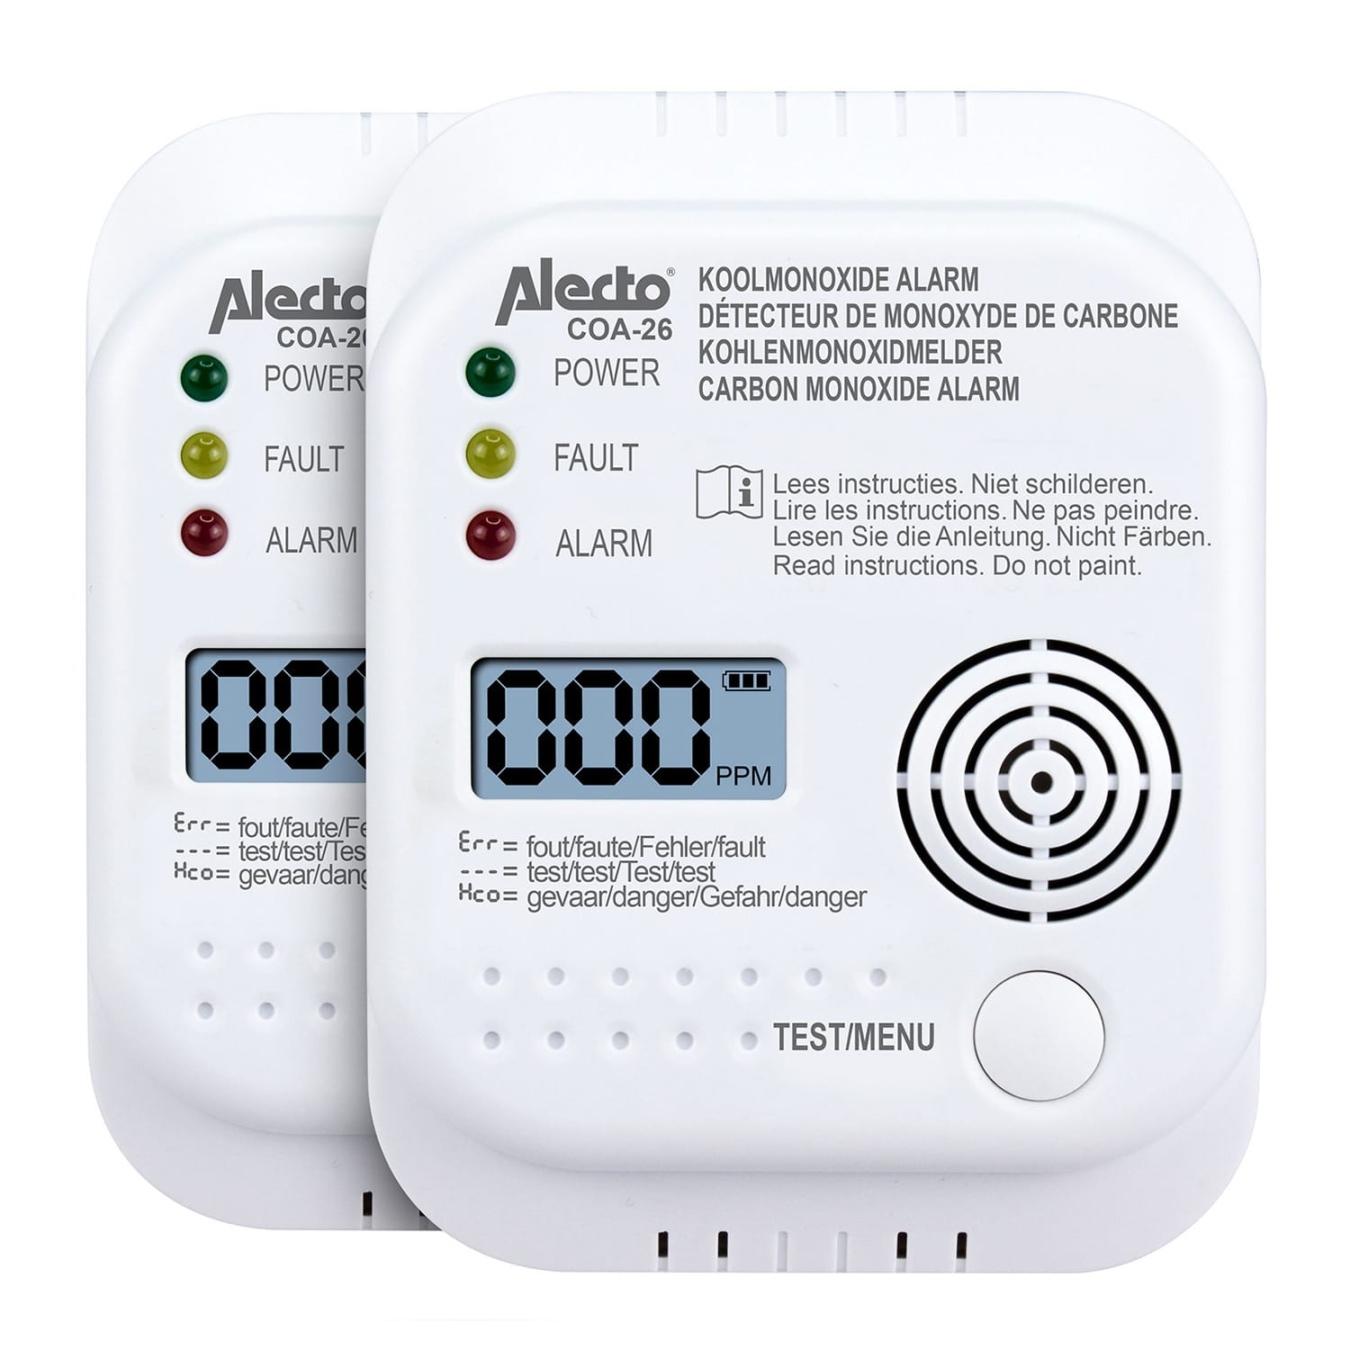 Koop Alecto COA-26 Koolmonoxidemelder 2-pack